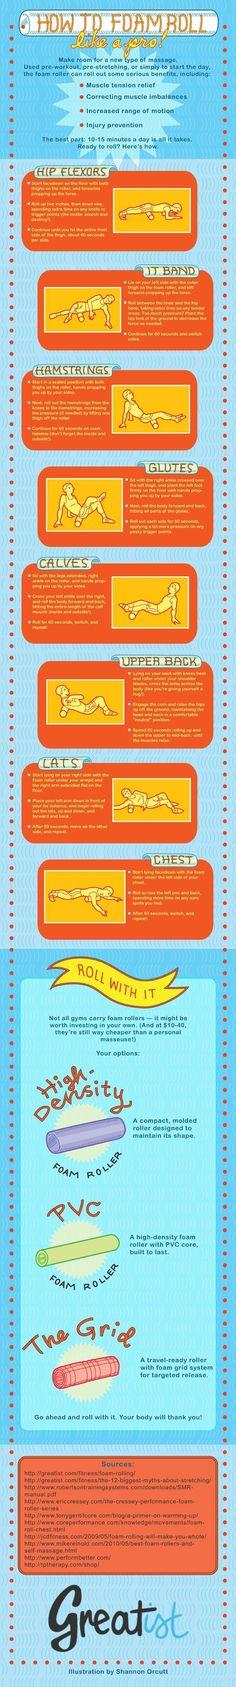 Foam roller exercises :-)